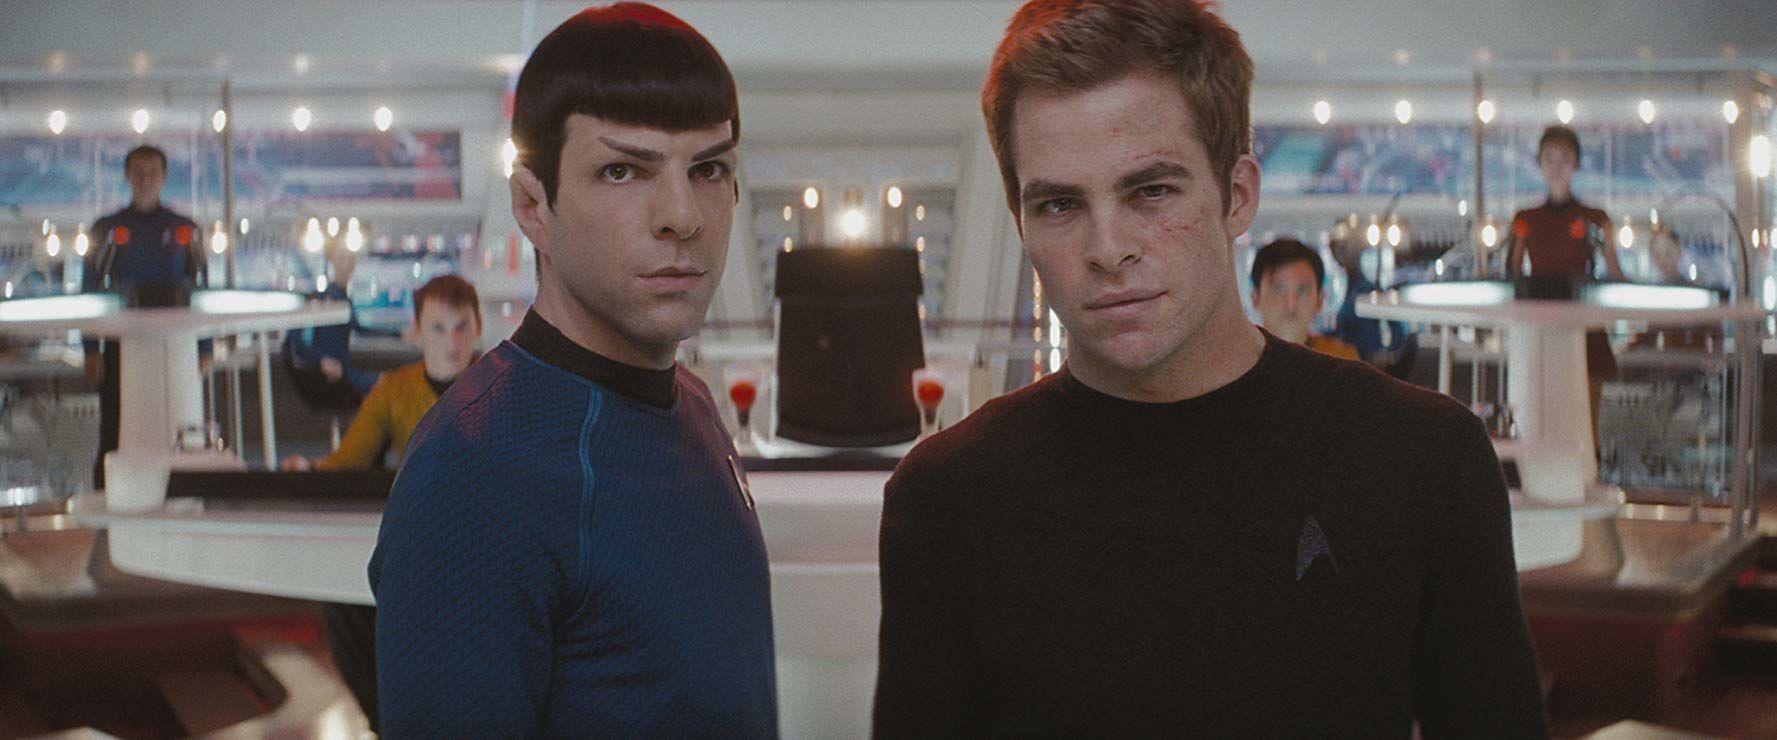 Star Trek (2009) Official Trailer - Chris Pine, Eric Bana, Zoe Saldana Movie HD